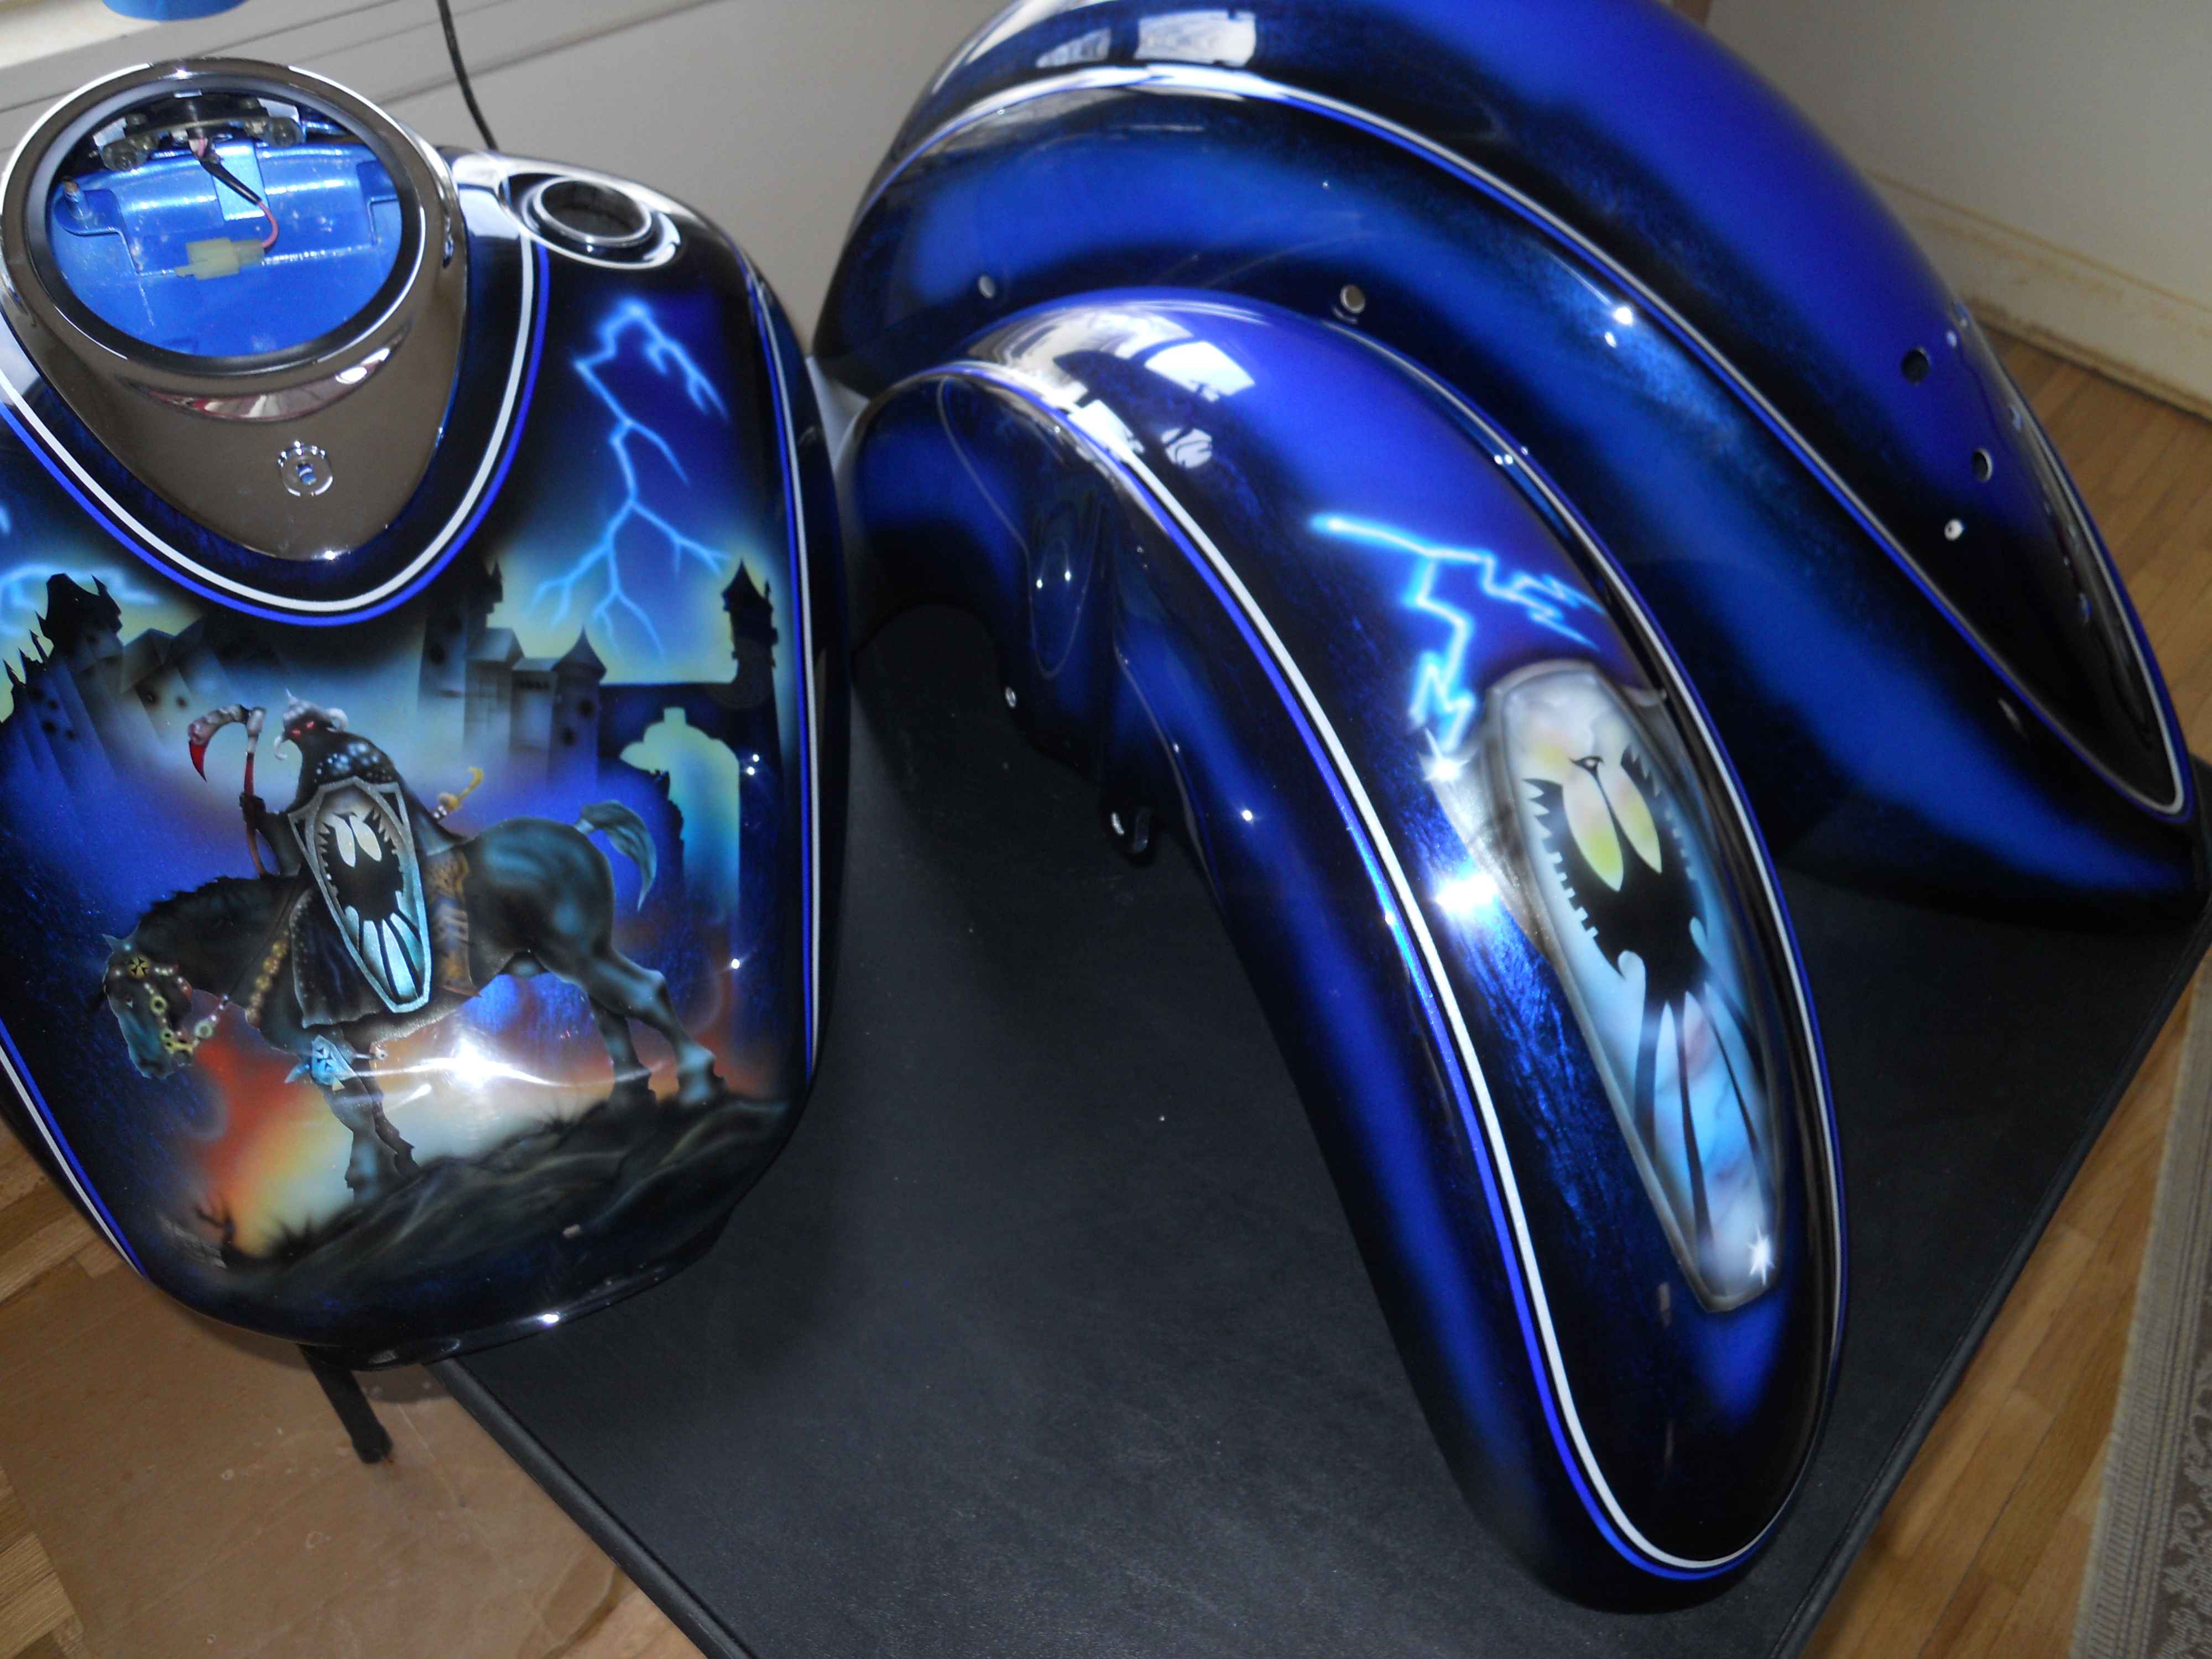 Harley-Davidson-Knight-Reaper-Gastank-Fenders